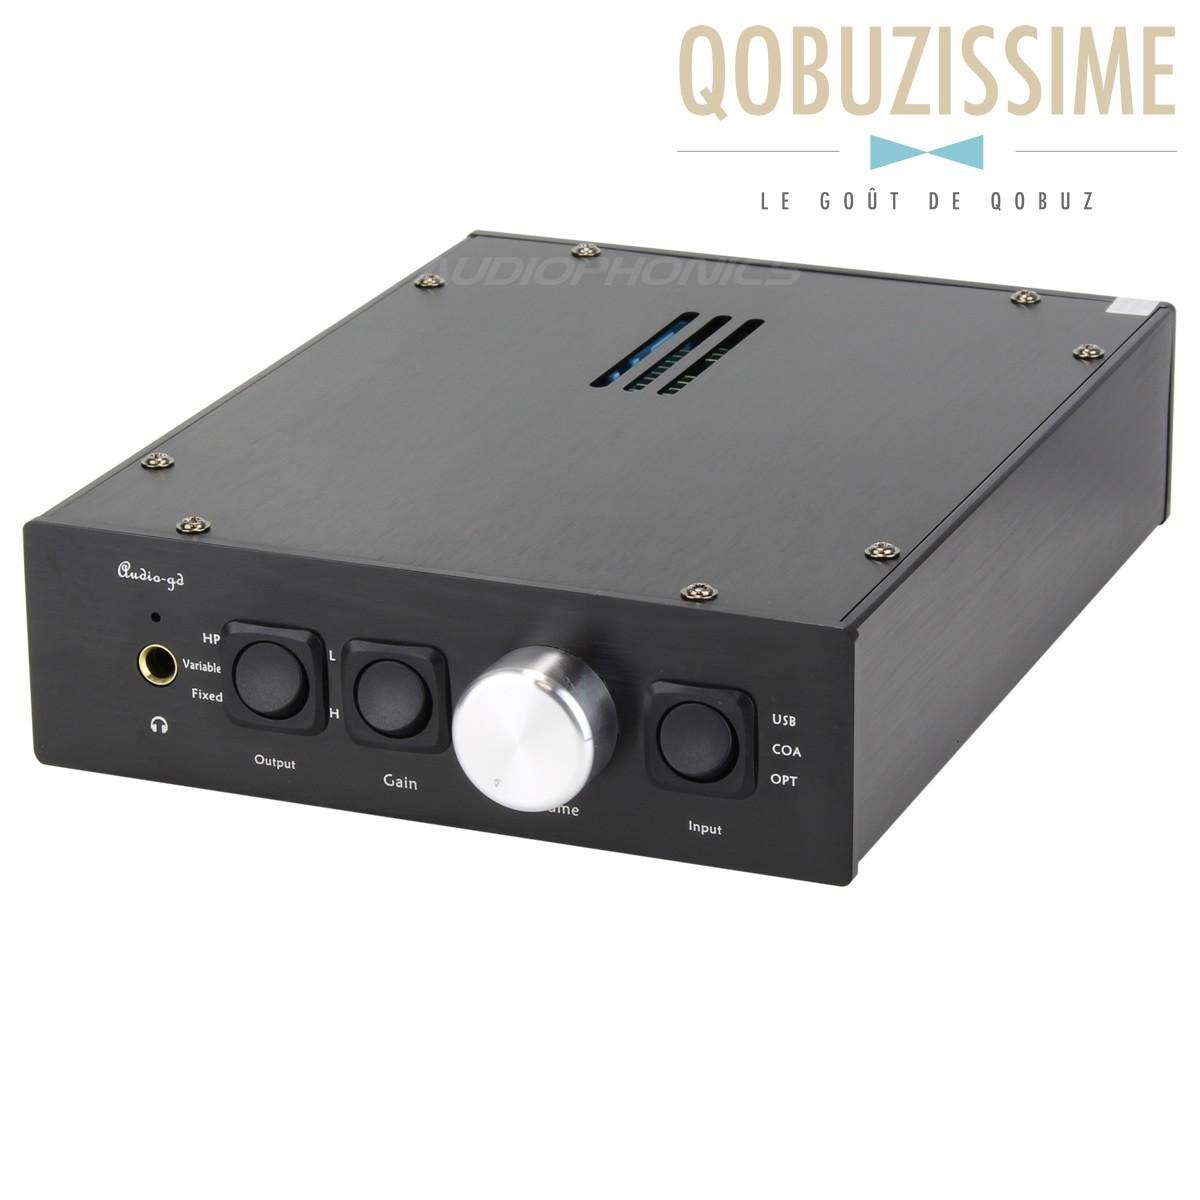 AUDIO-GD NFB-15 (2014) DAC / Preamp / Ampli 24bit/192kHz 2x WM8741 TCXO